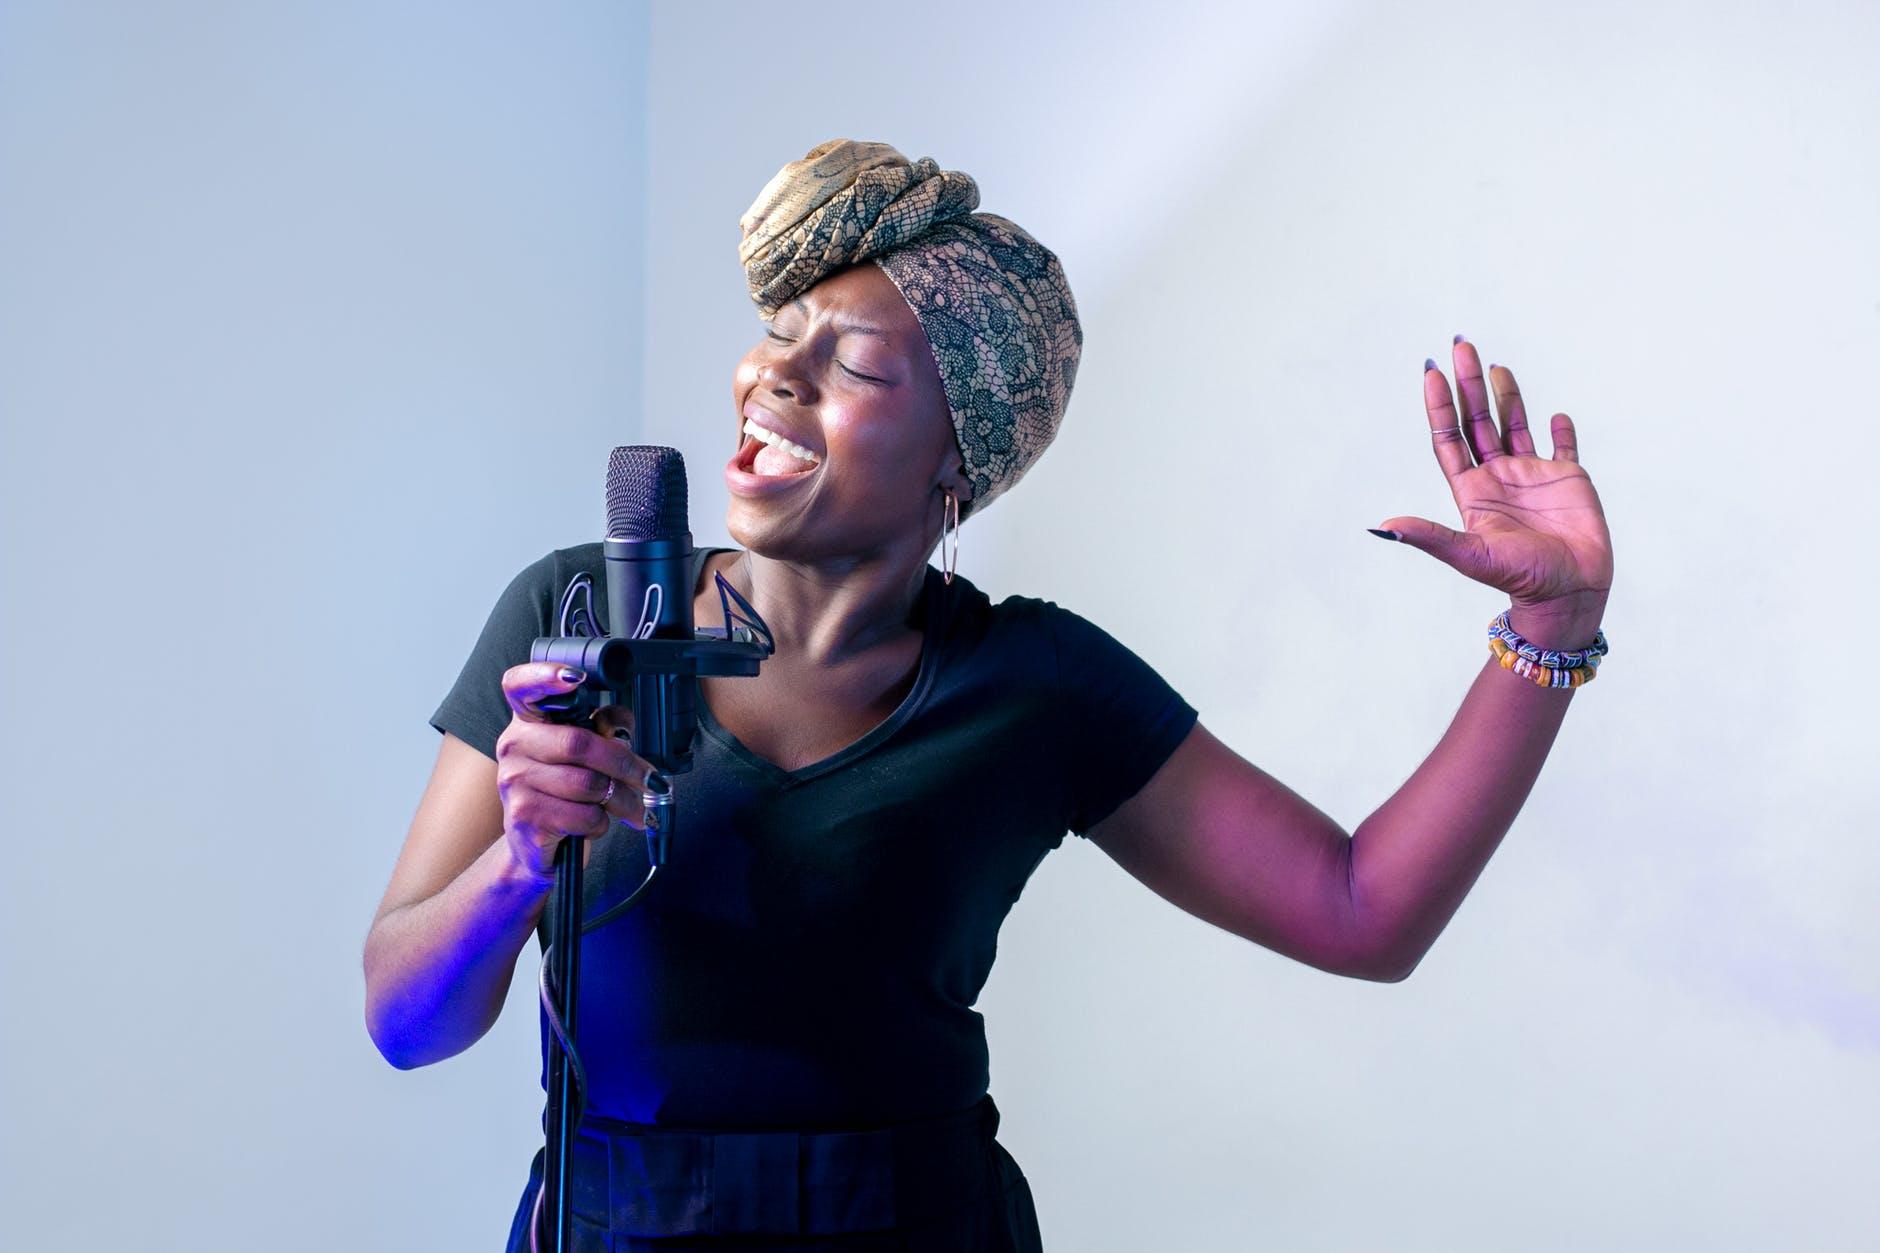 photo of woman singing in music studio